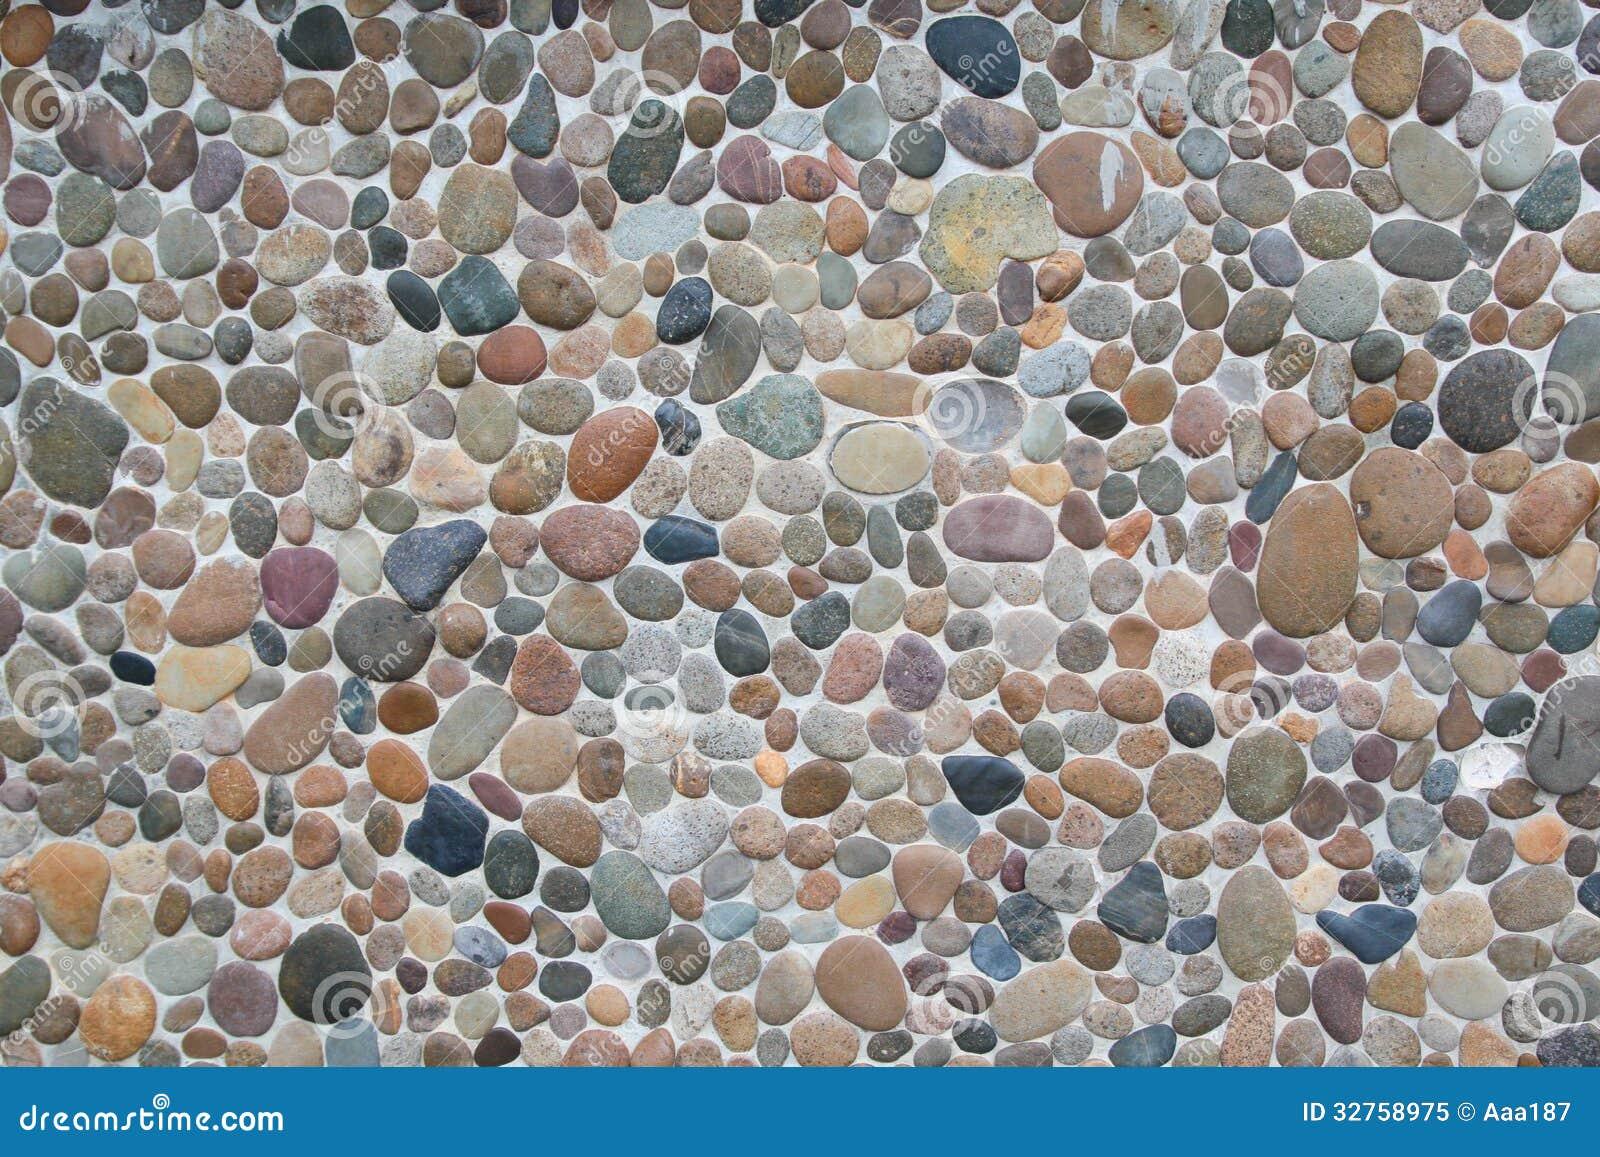 Pentagon Shaped Pattern On A Stone Floor Flooring : Stone rock floor pattern stock image of ground